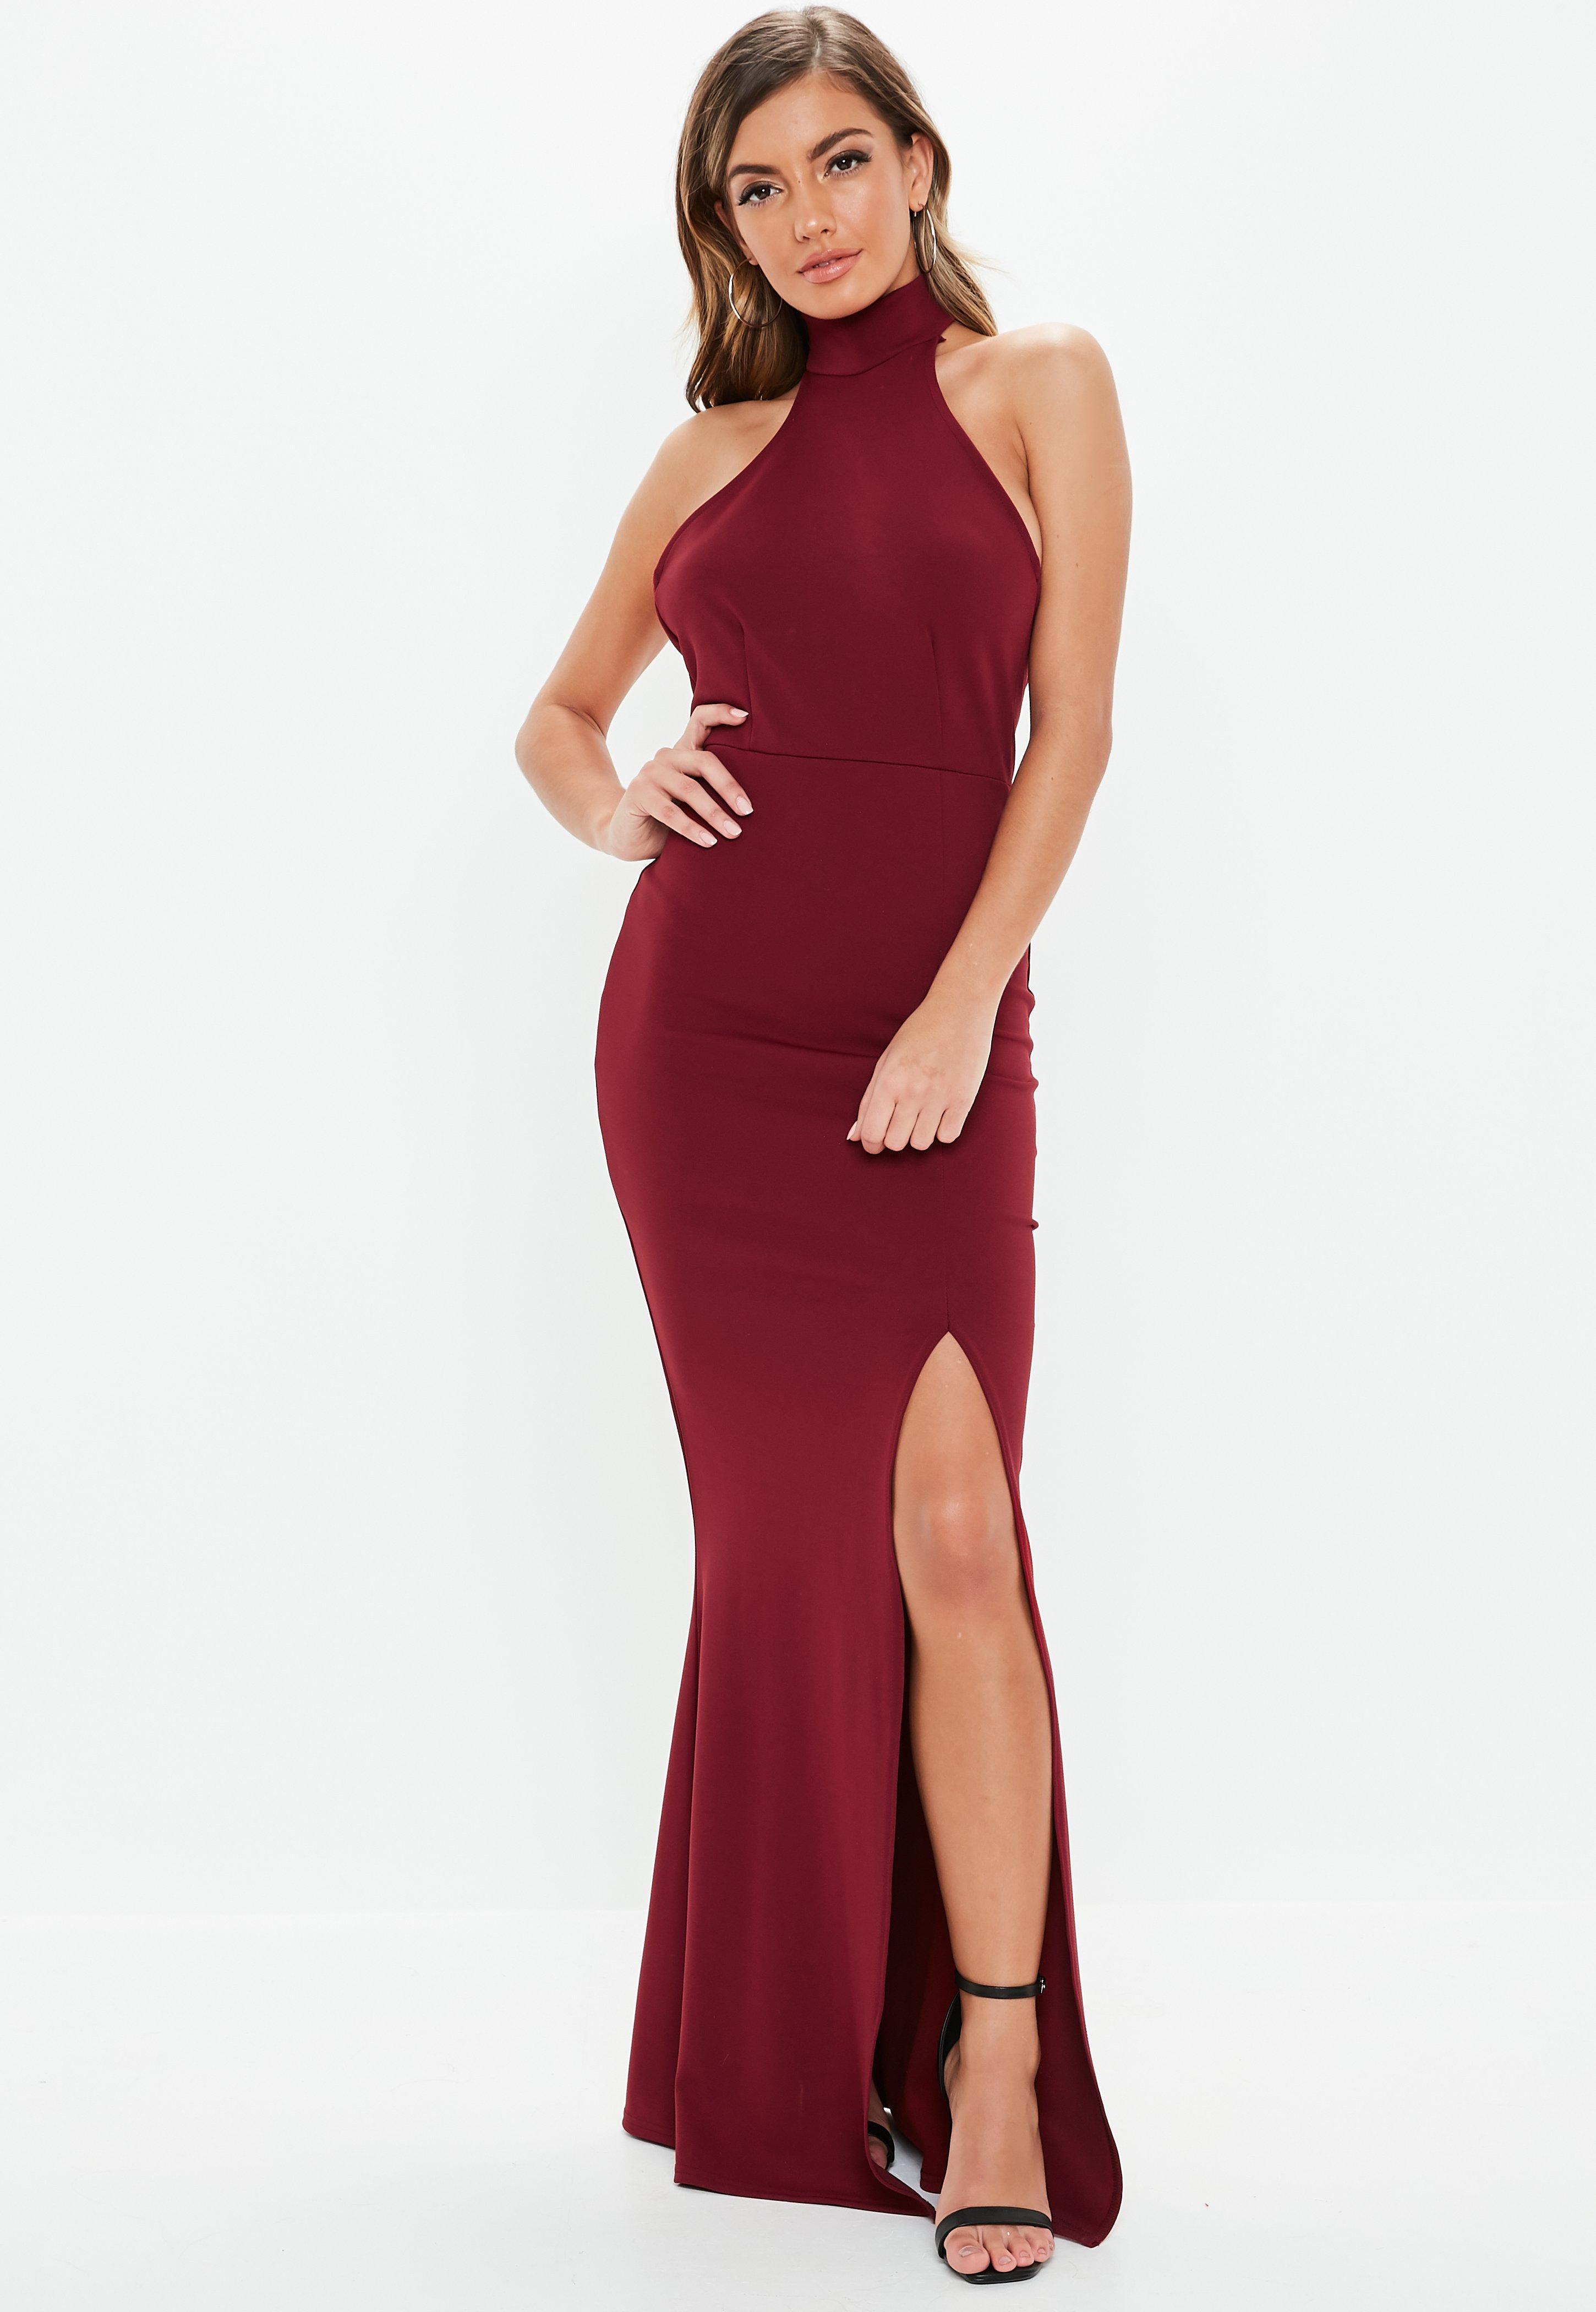 c81ff76c43 Burgundowa sukienka maxi z chokerem